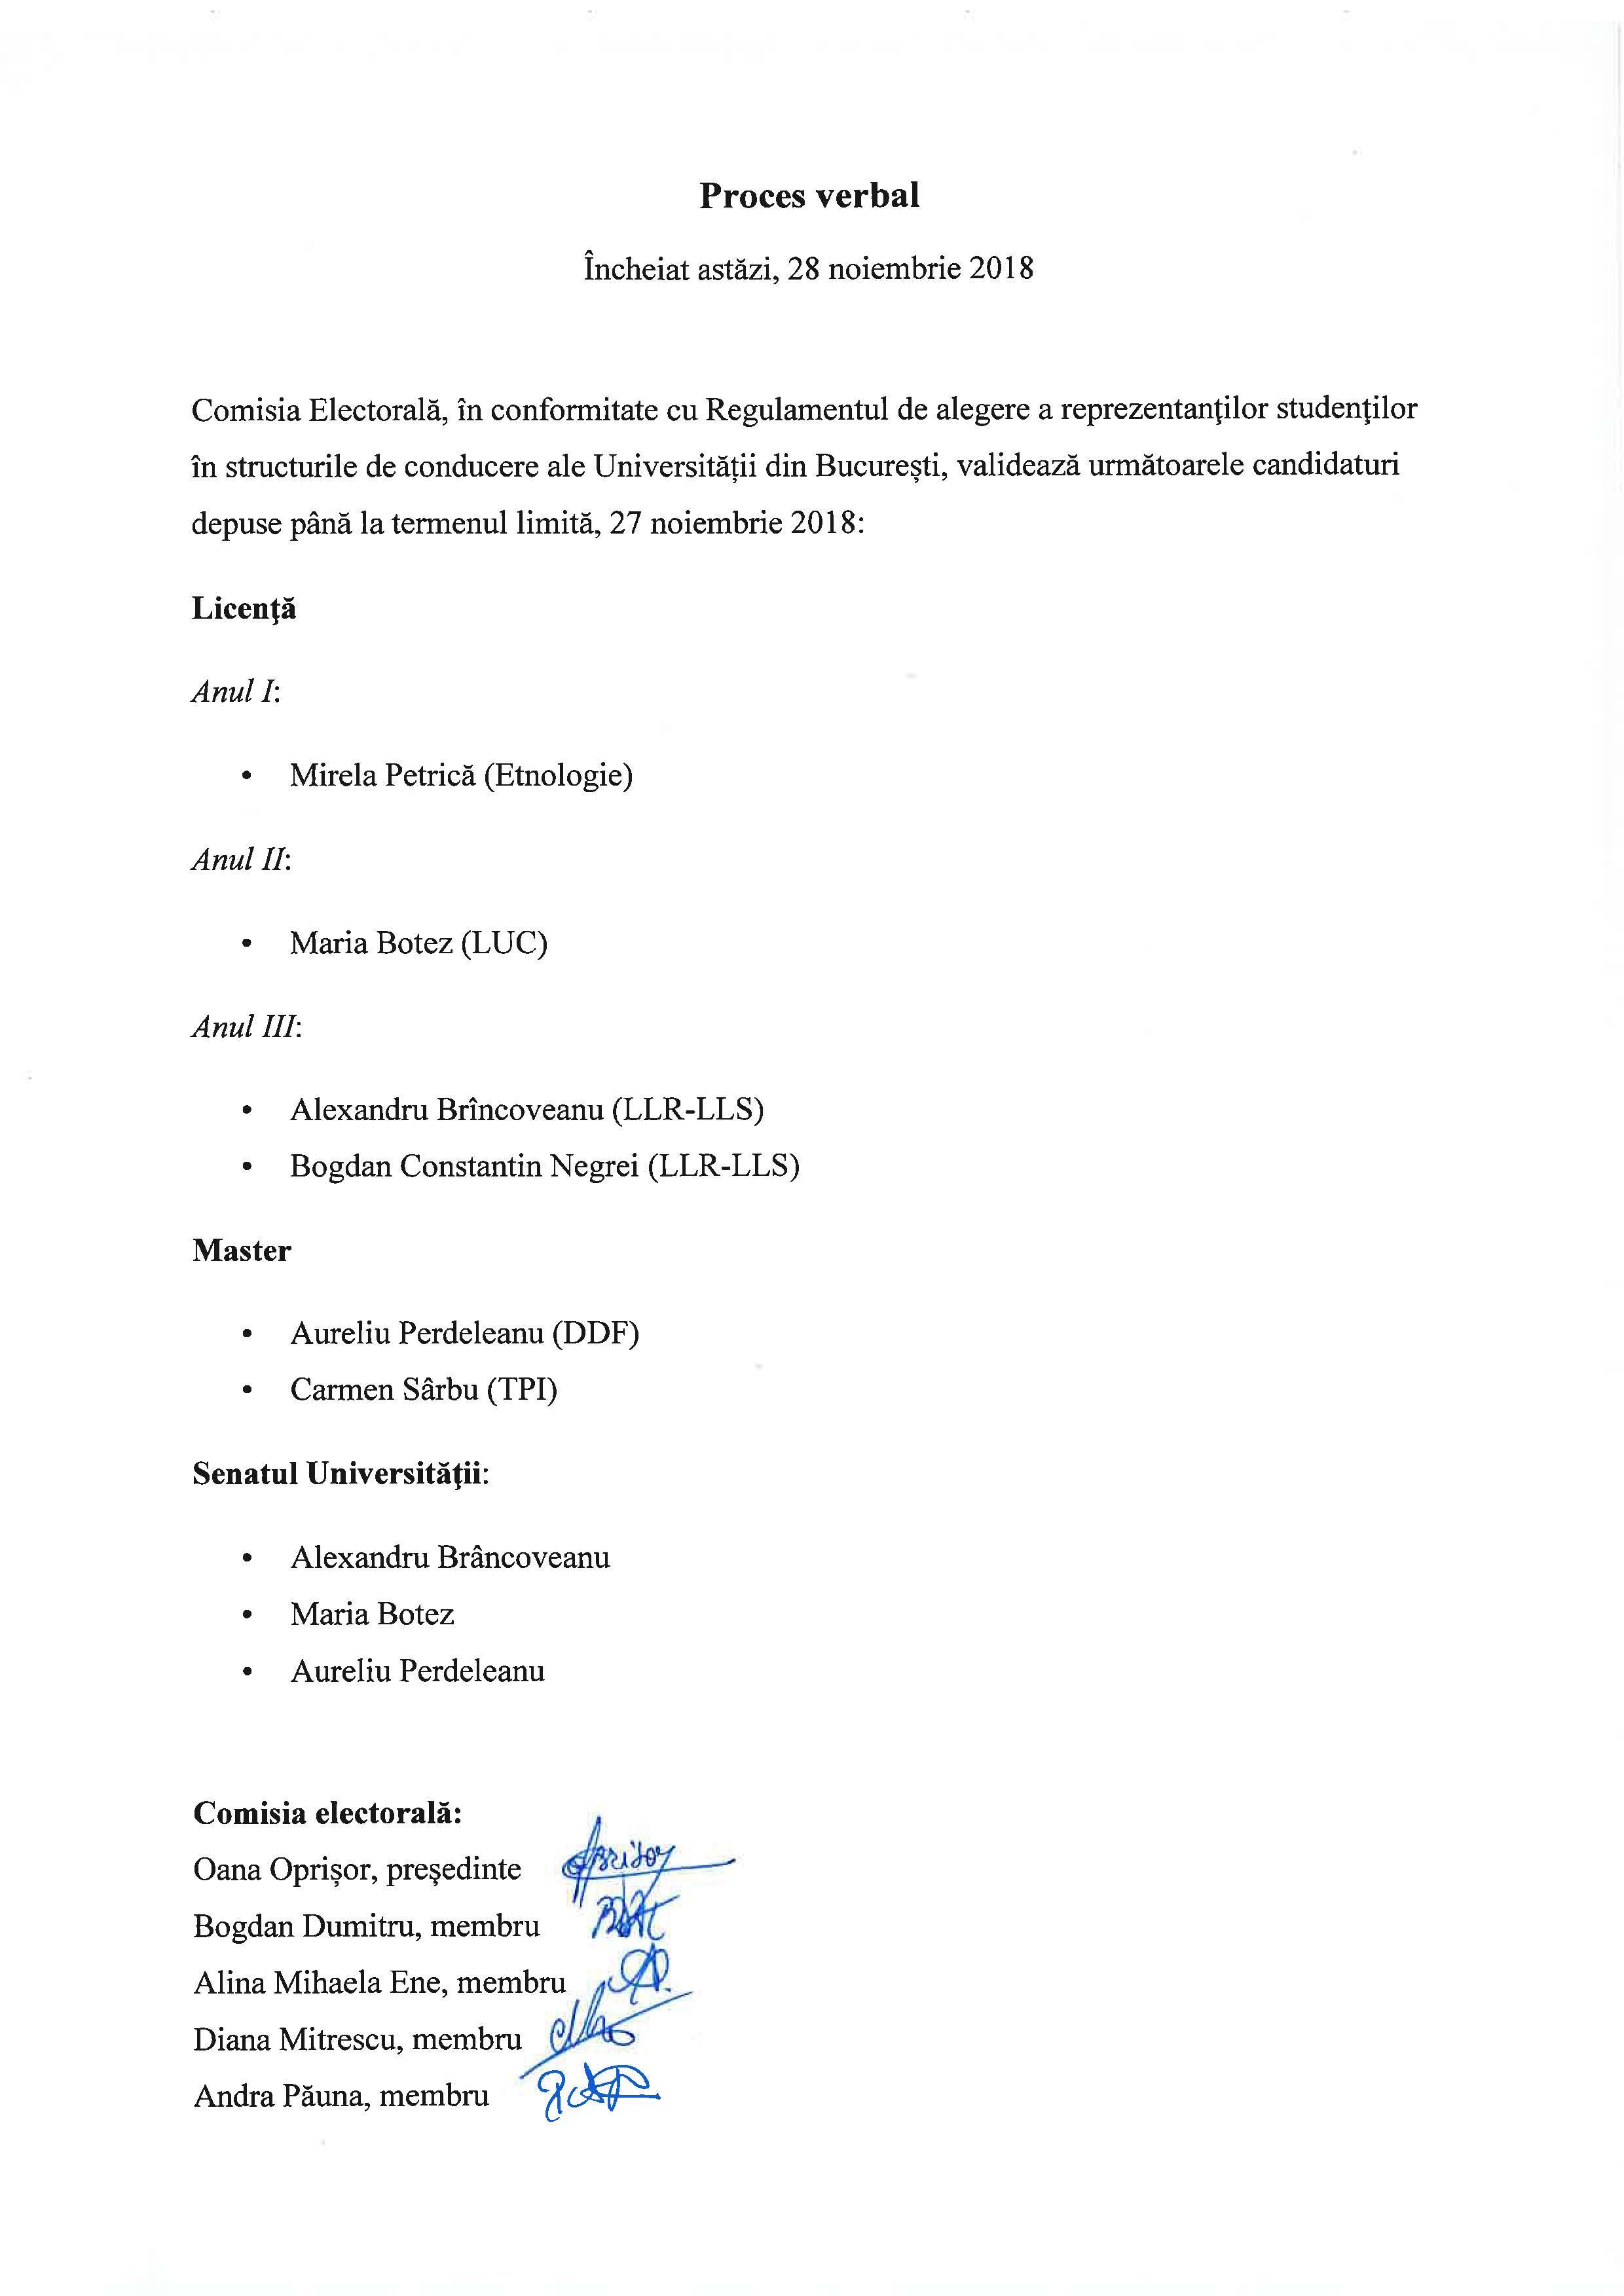 PV- validare-candidati-28.11.2018